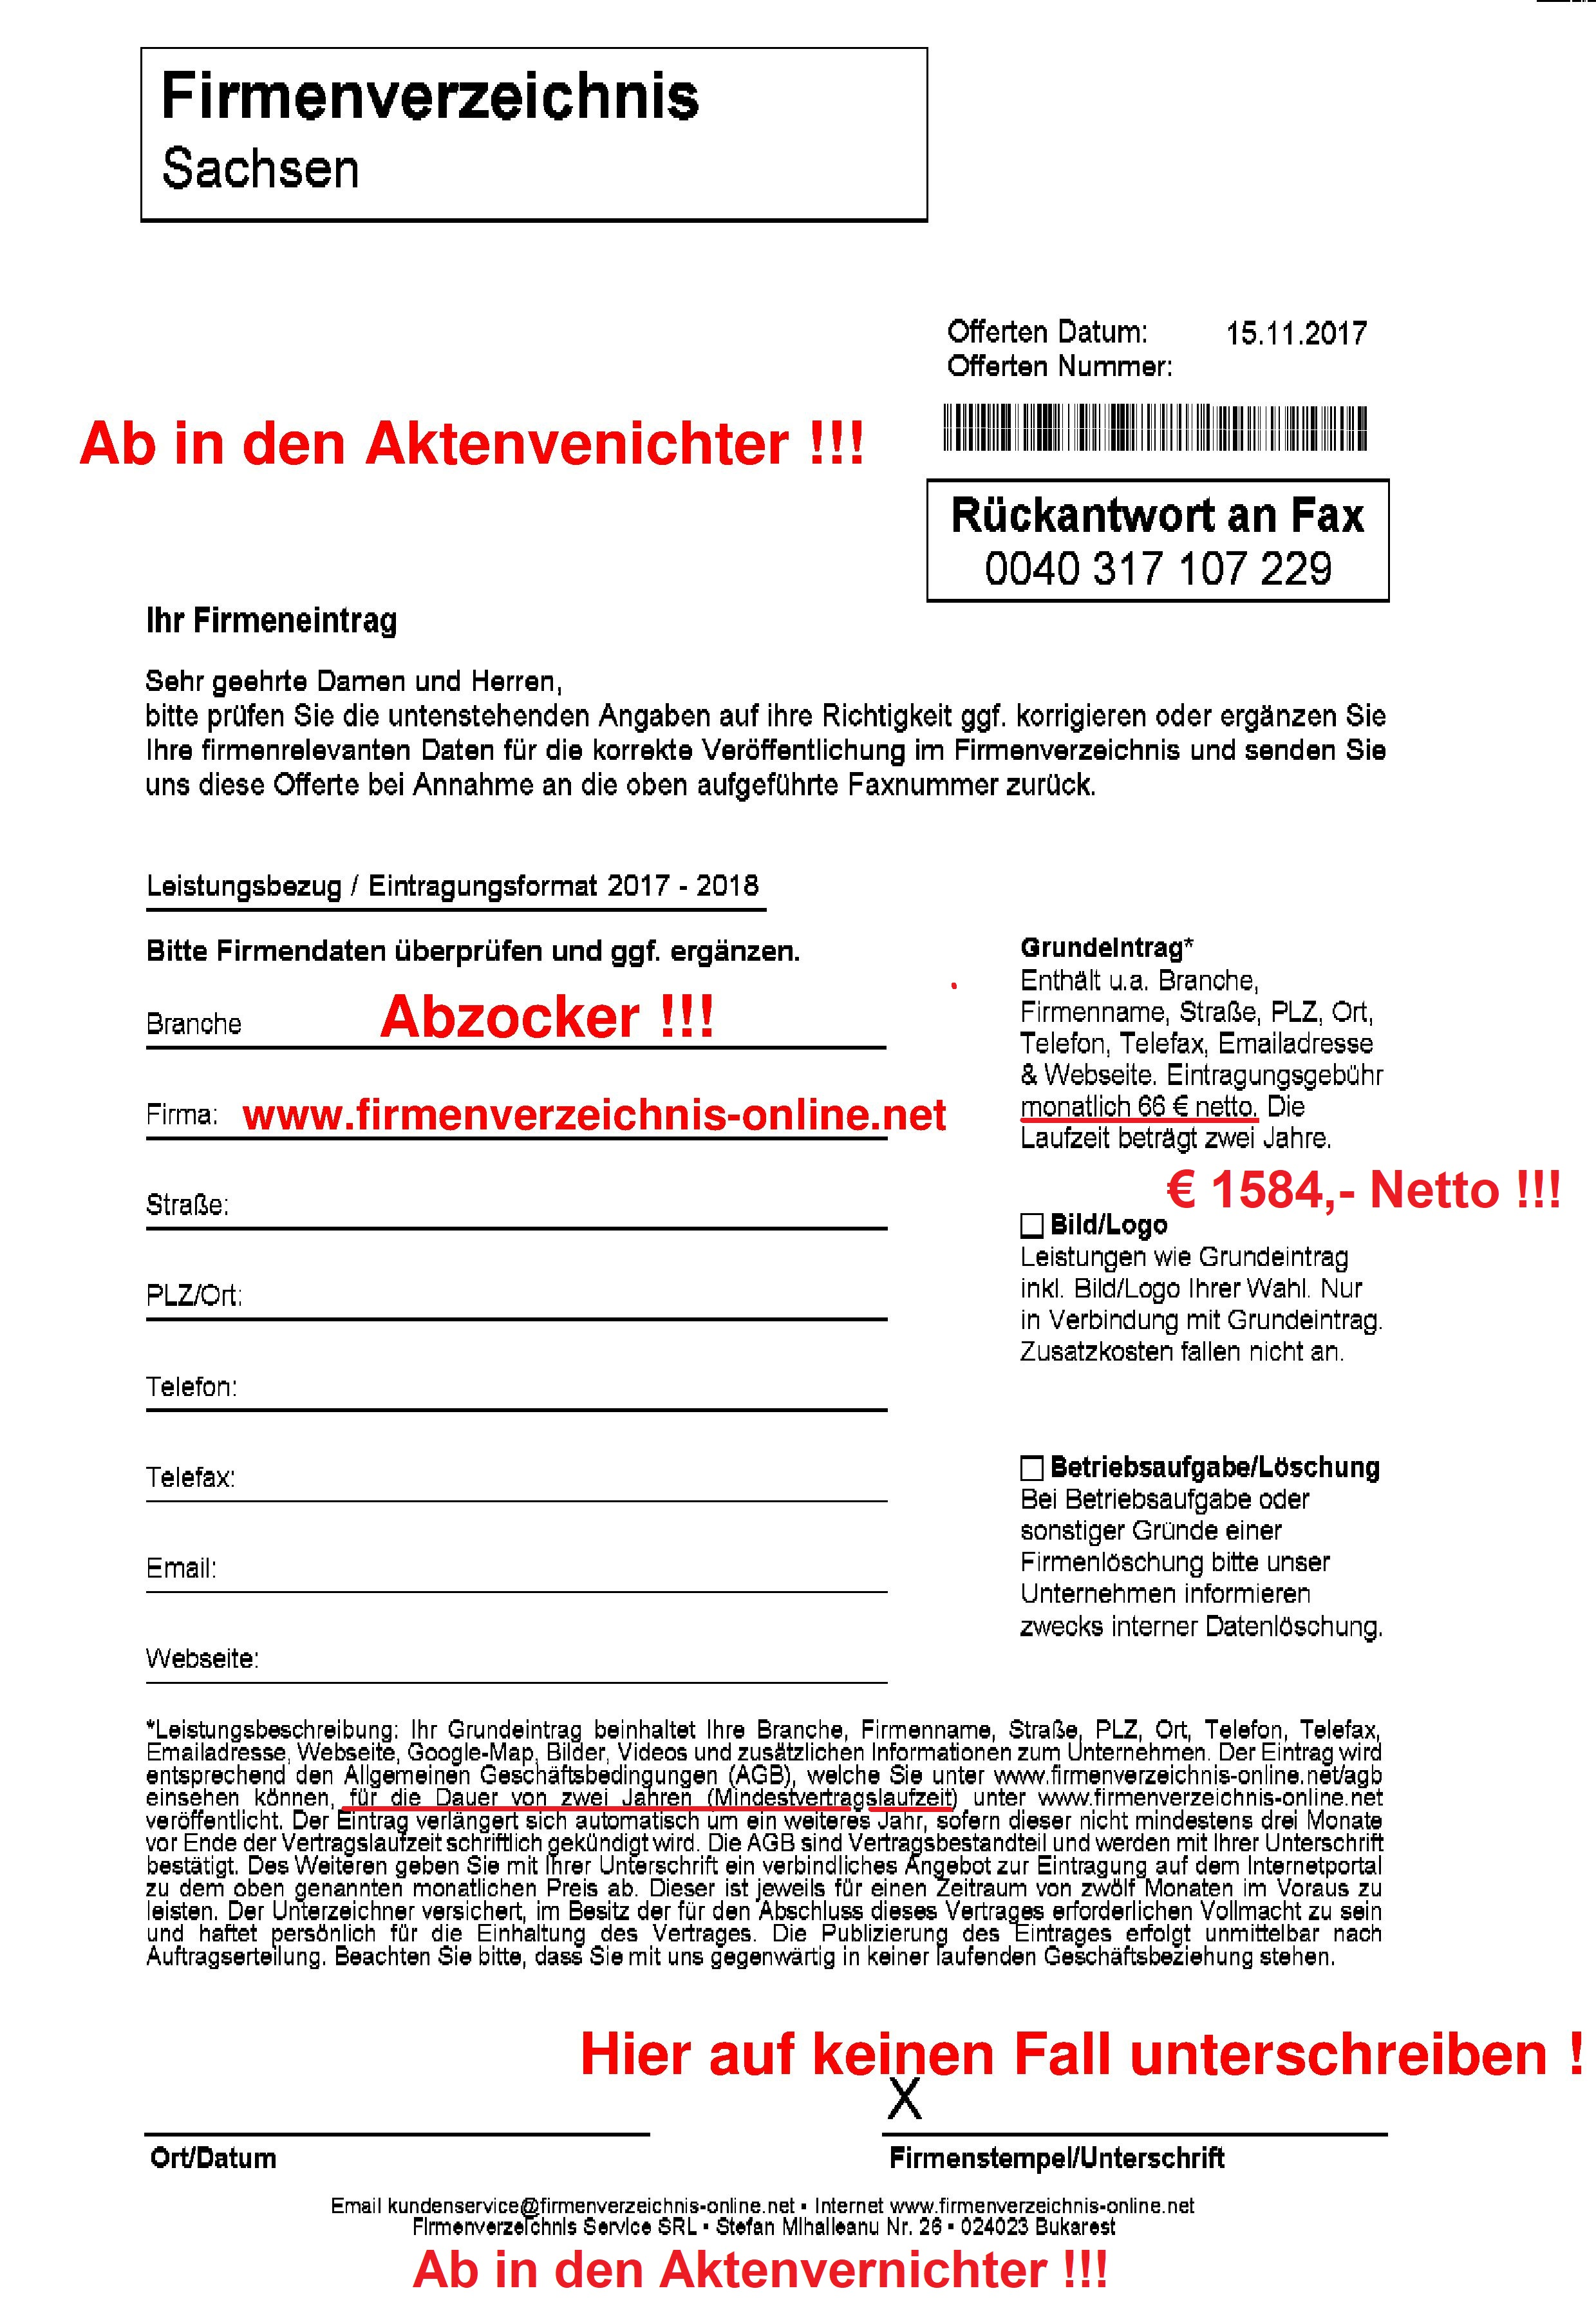 www.firmenverzeichnis-online.net